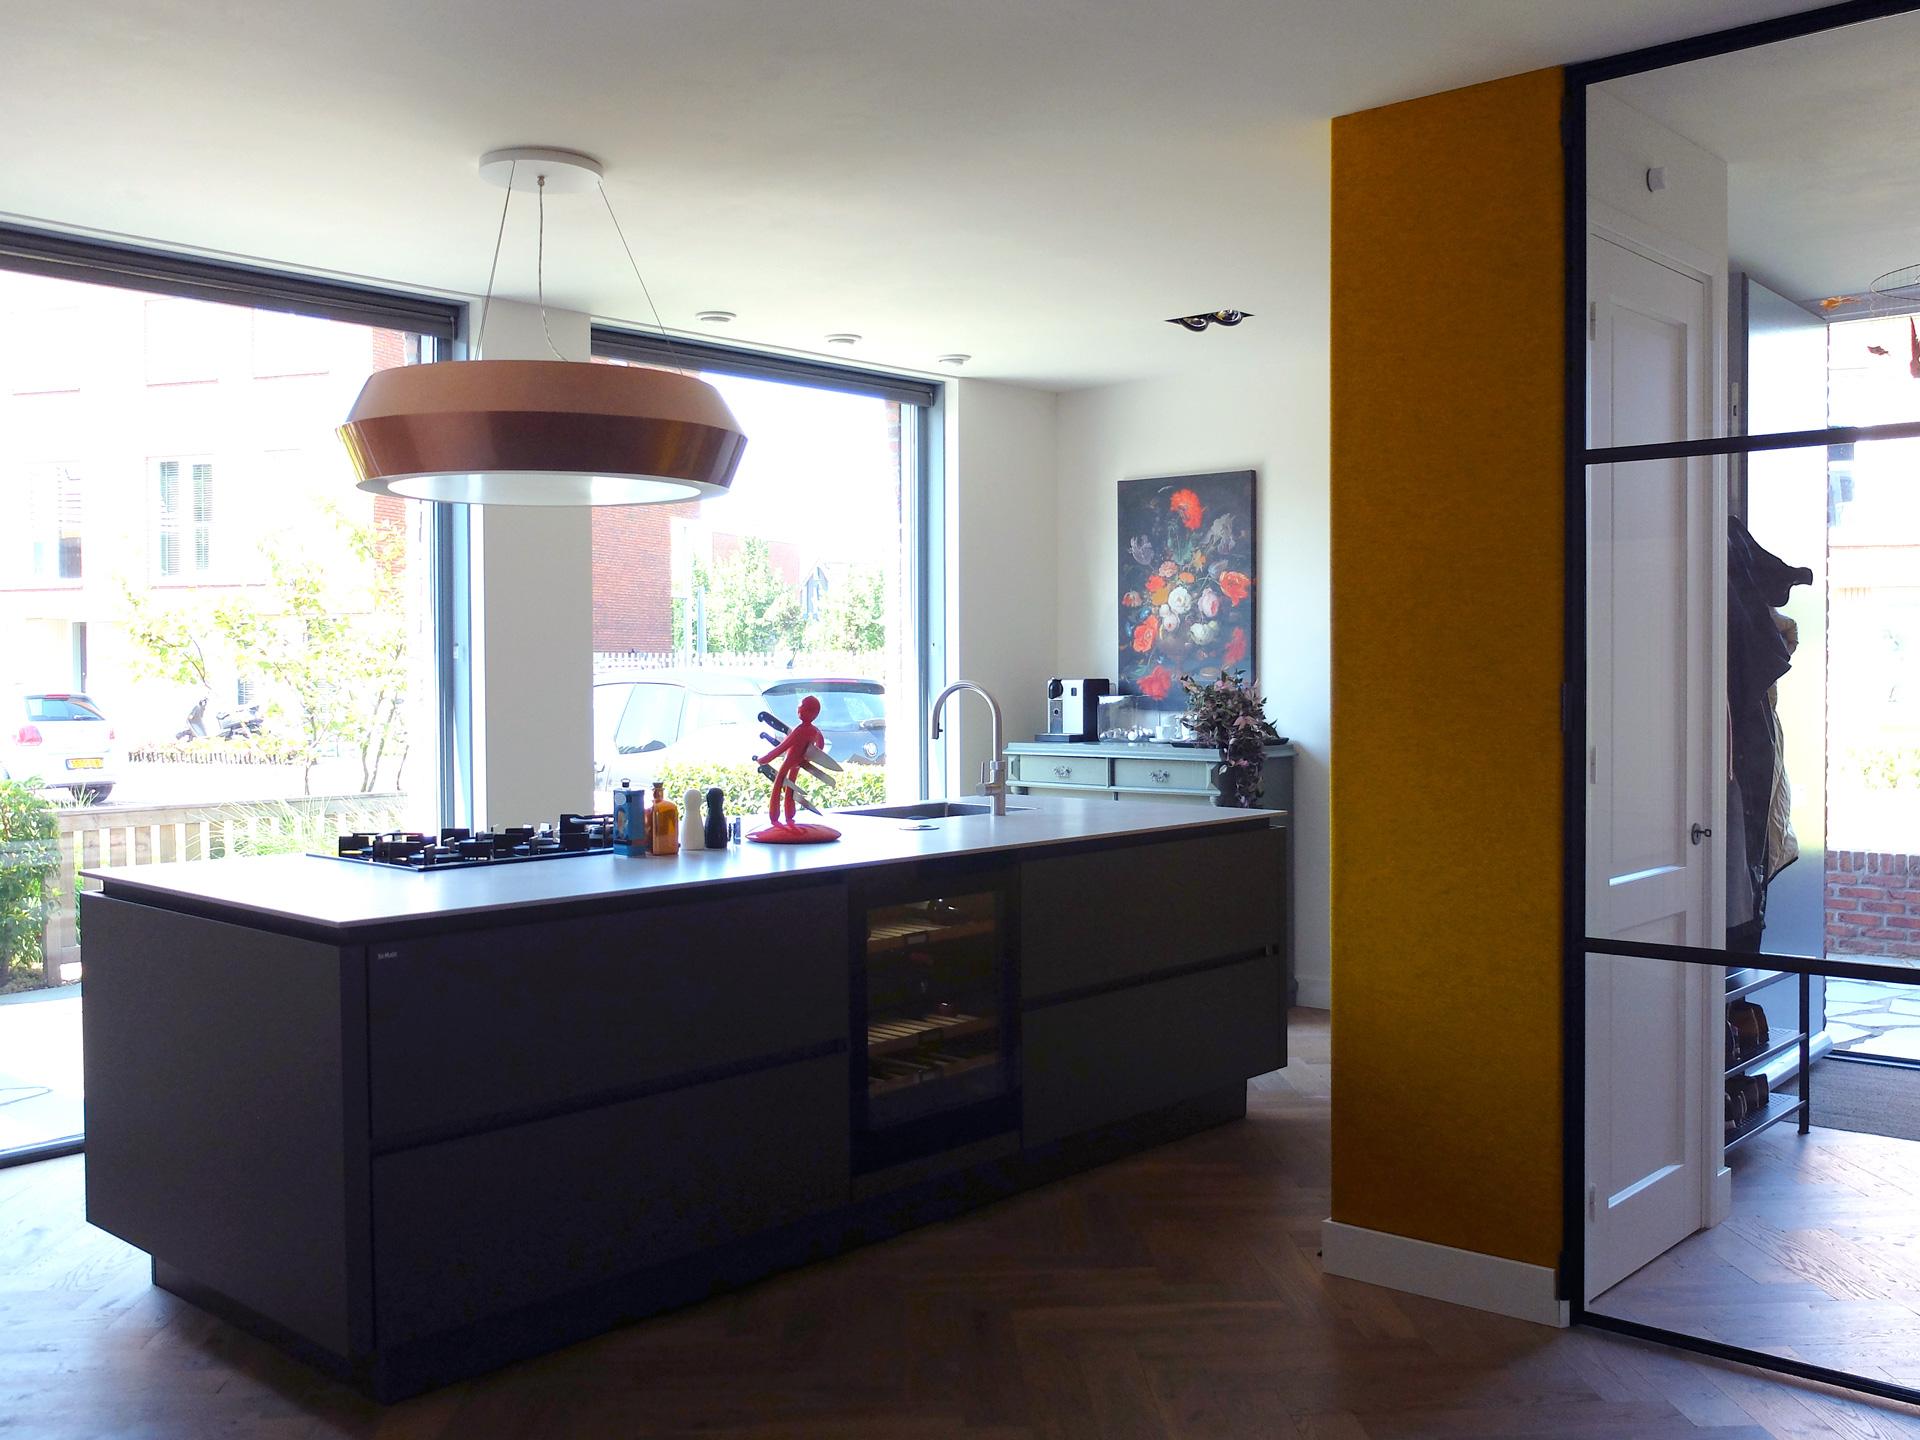 LAGADO-architects-orange-core-kitchen-island-felt-residential-interior-at-home